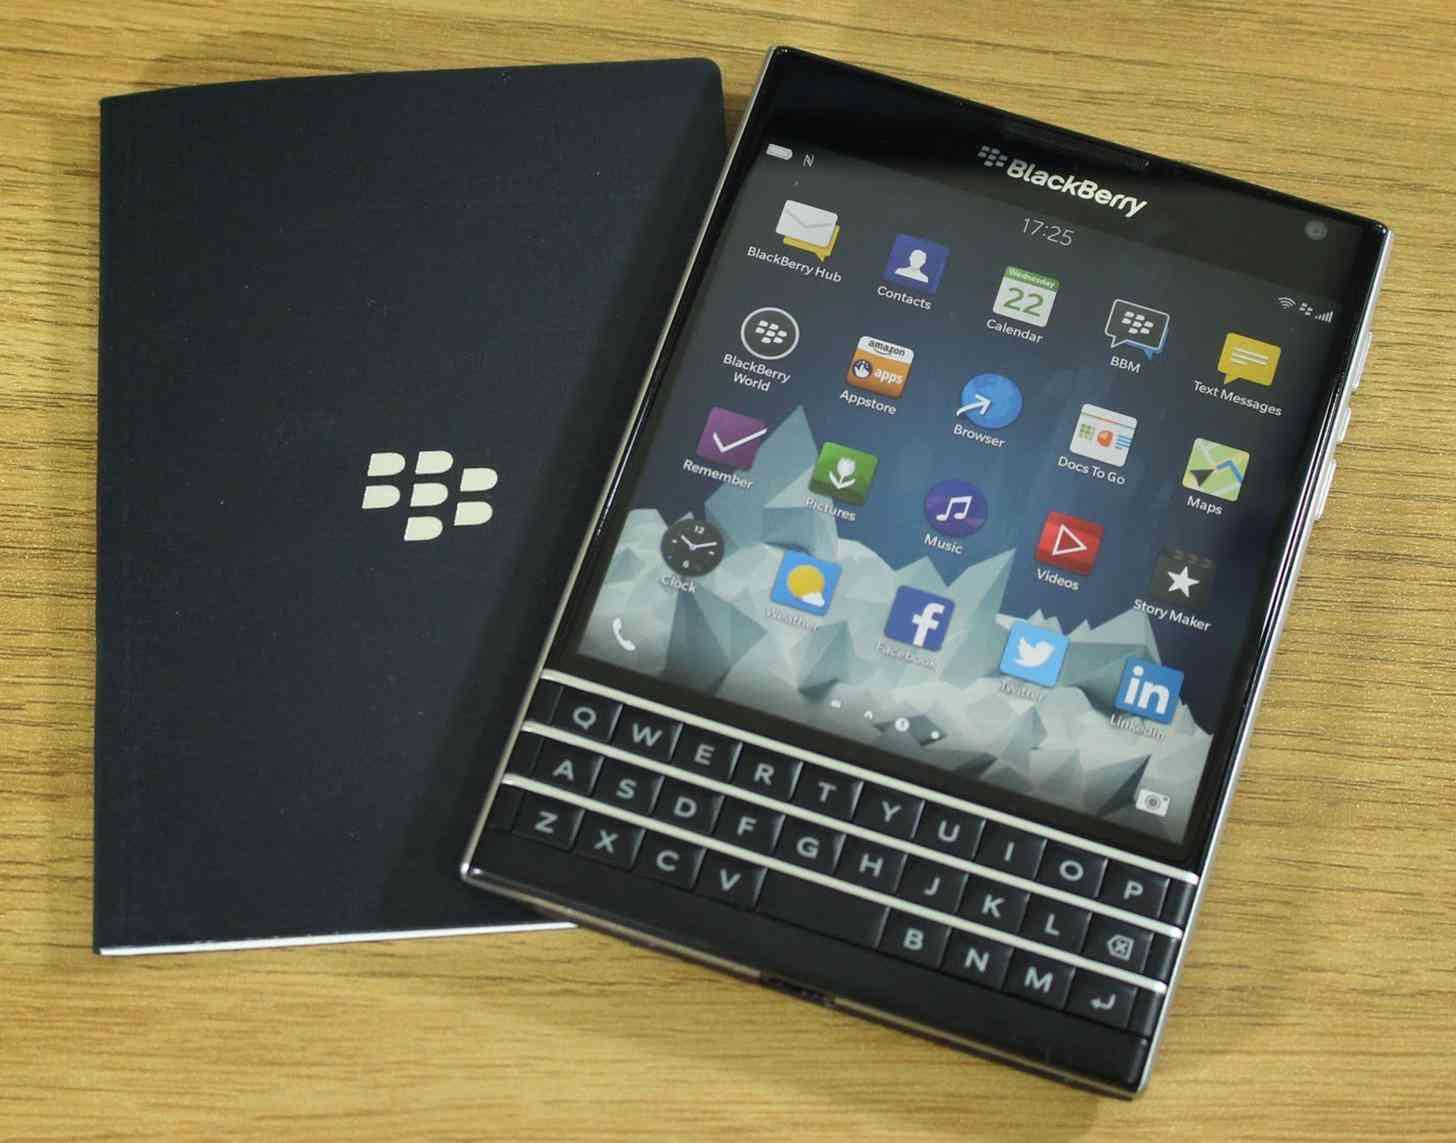 BlackBerry Passport review